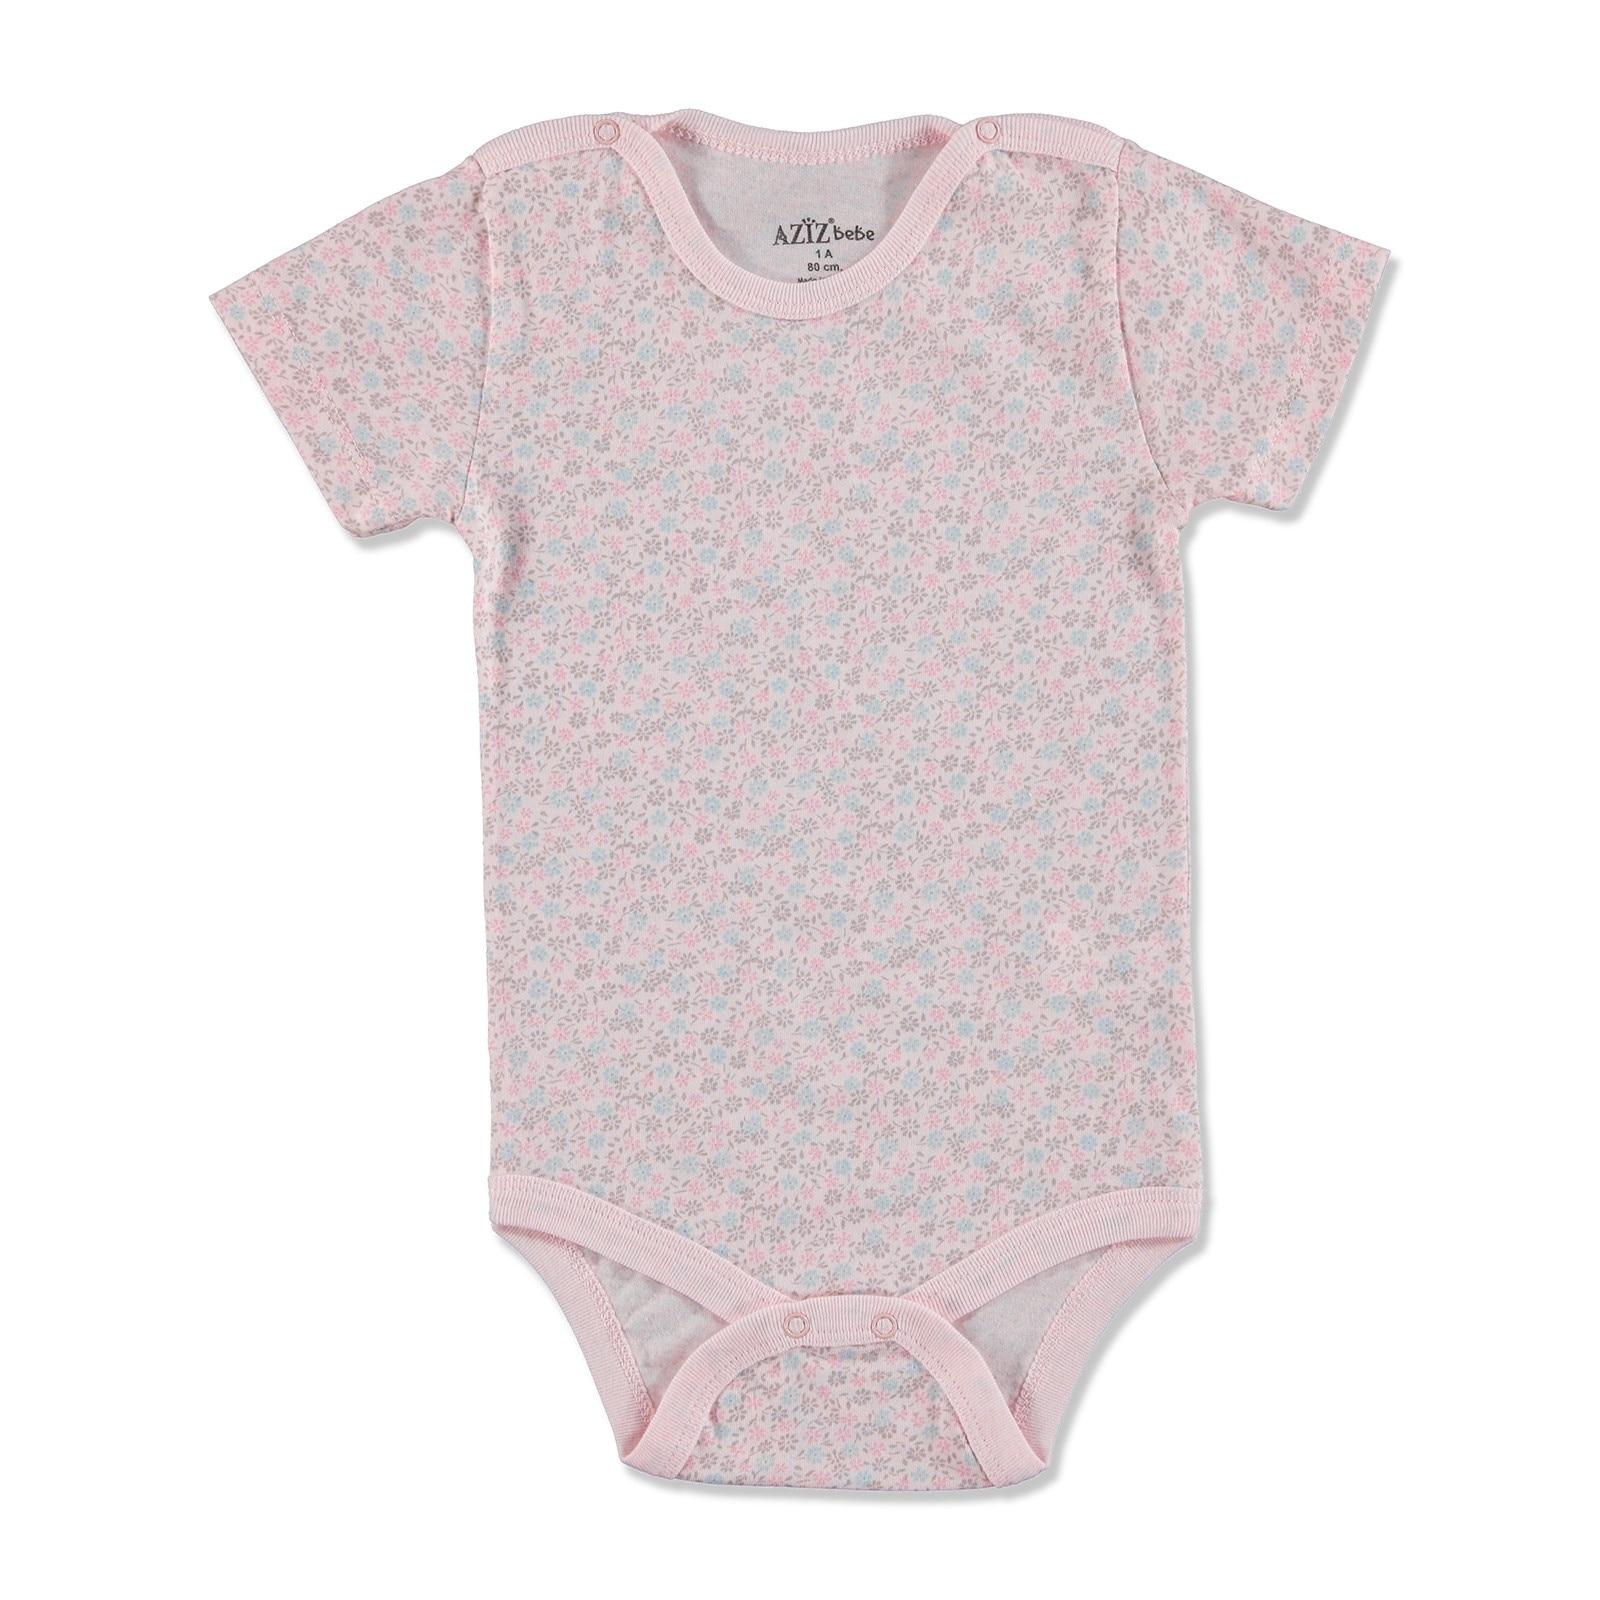 Ebebek Aziz Bebe Summer Baby Girl Flower Supreme Short Sleeve Bodysuit